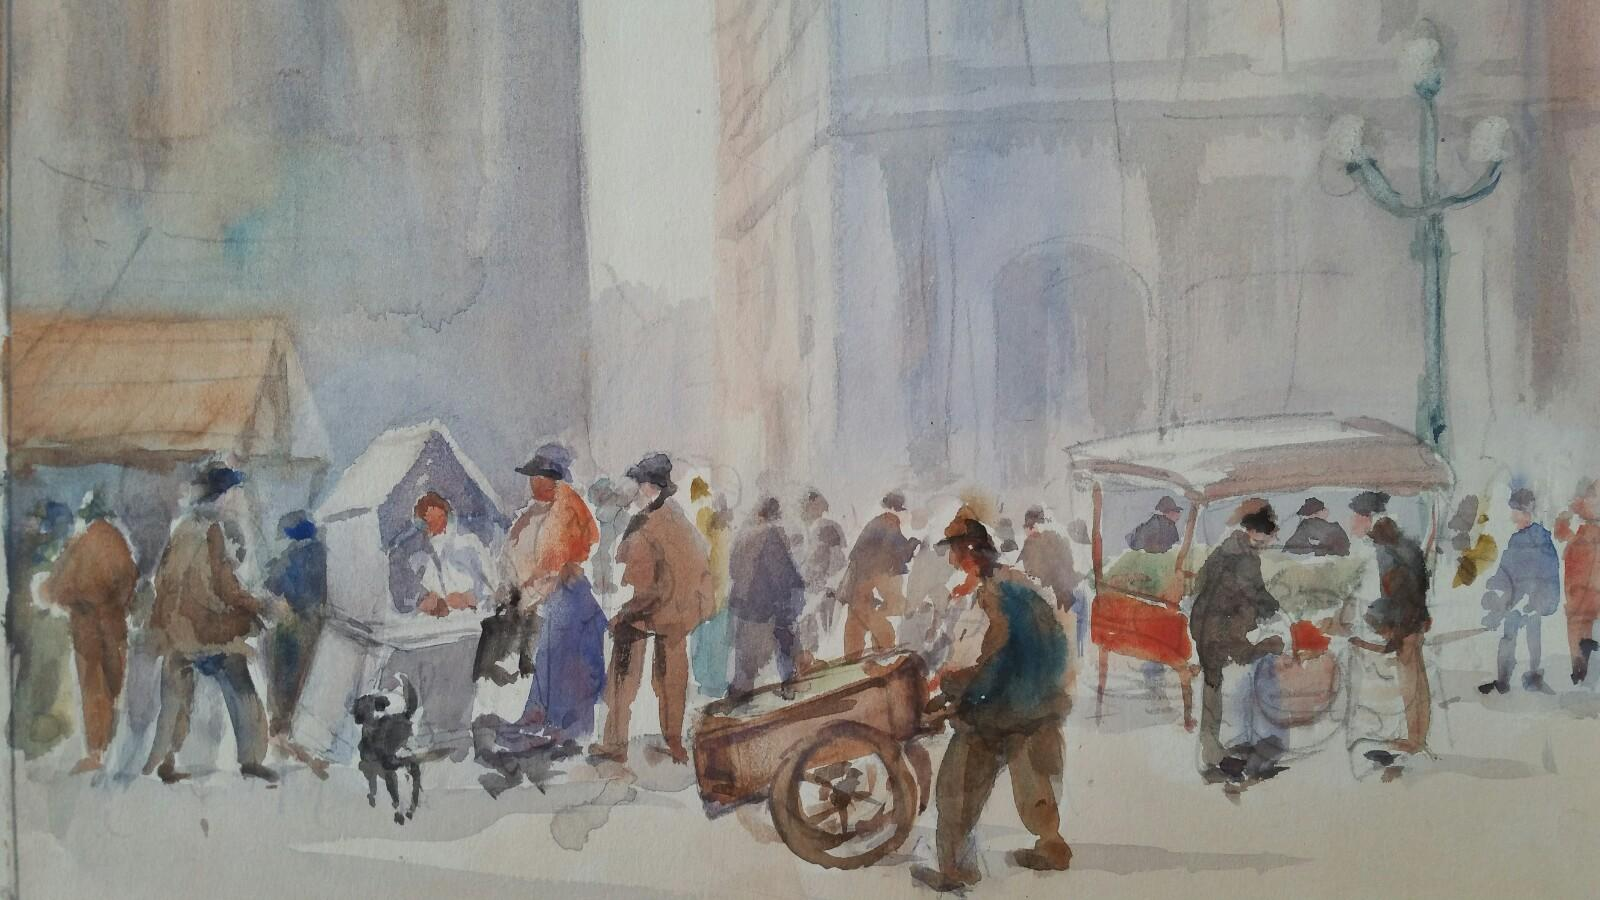 Mid 20th Century, Belgium, A Brussels Market Lottery Seller Scene